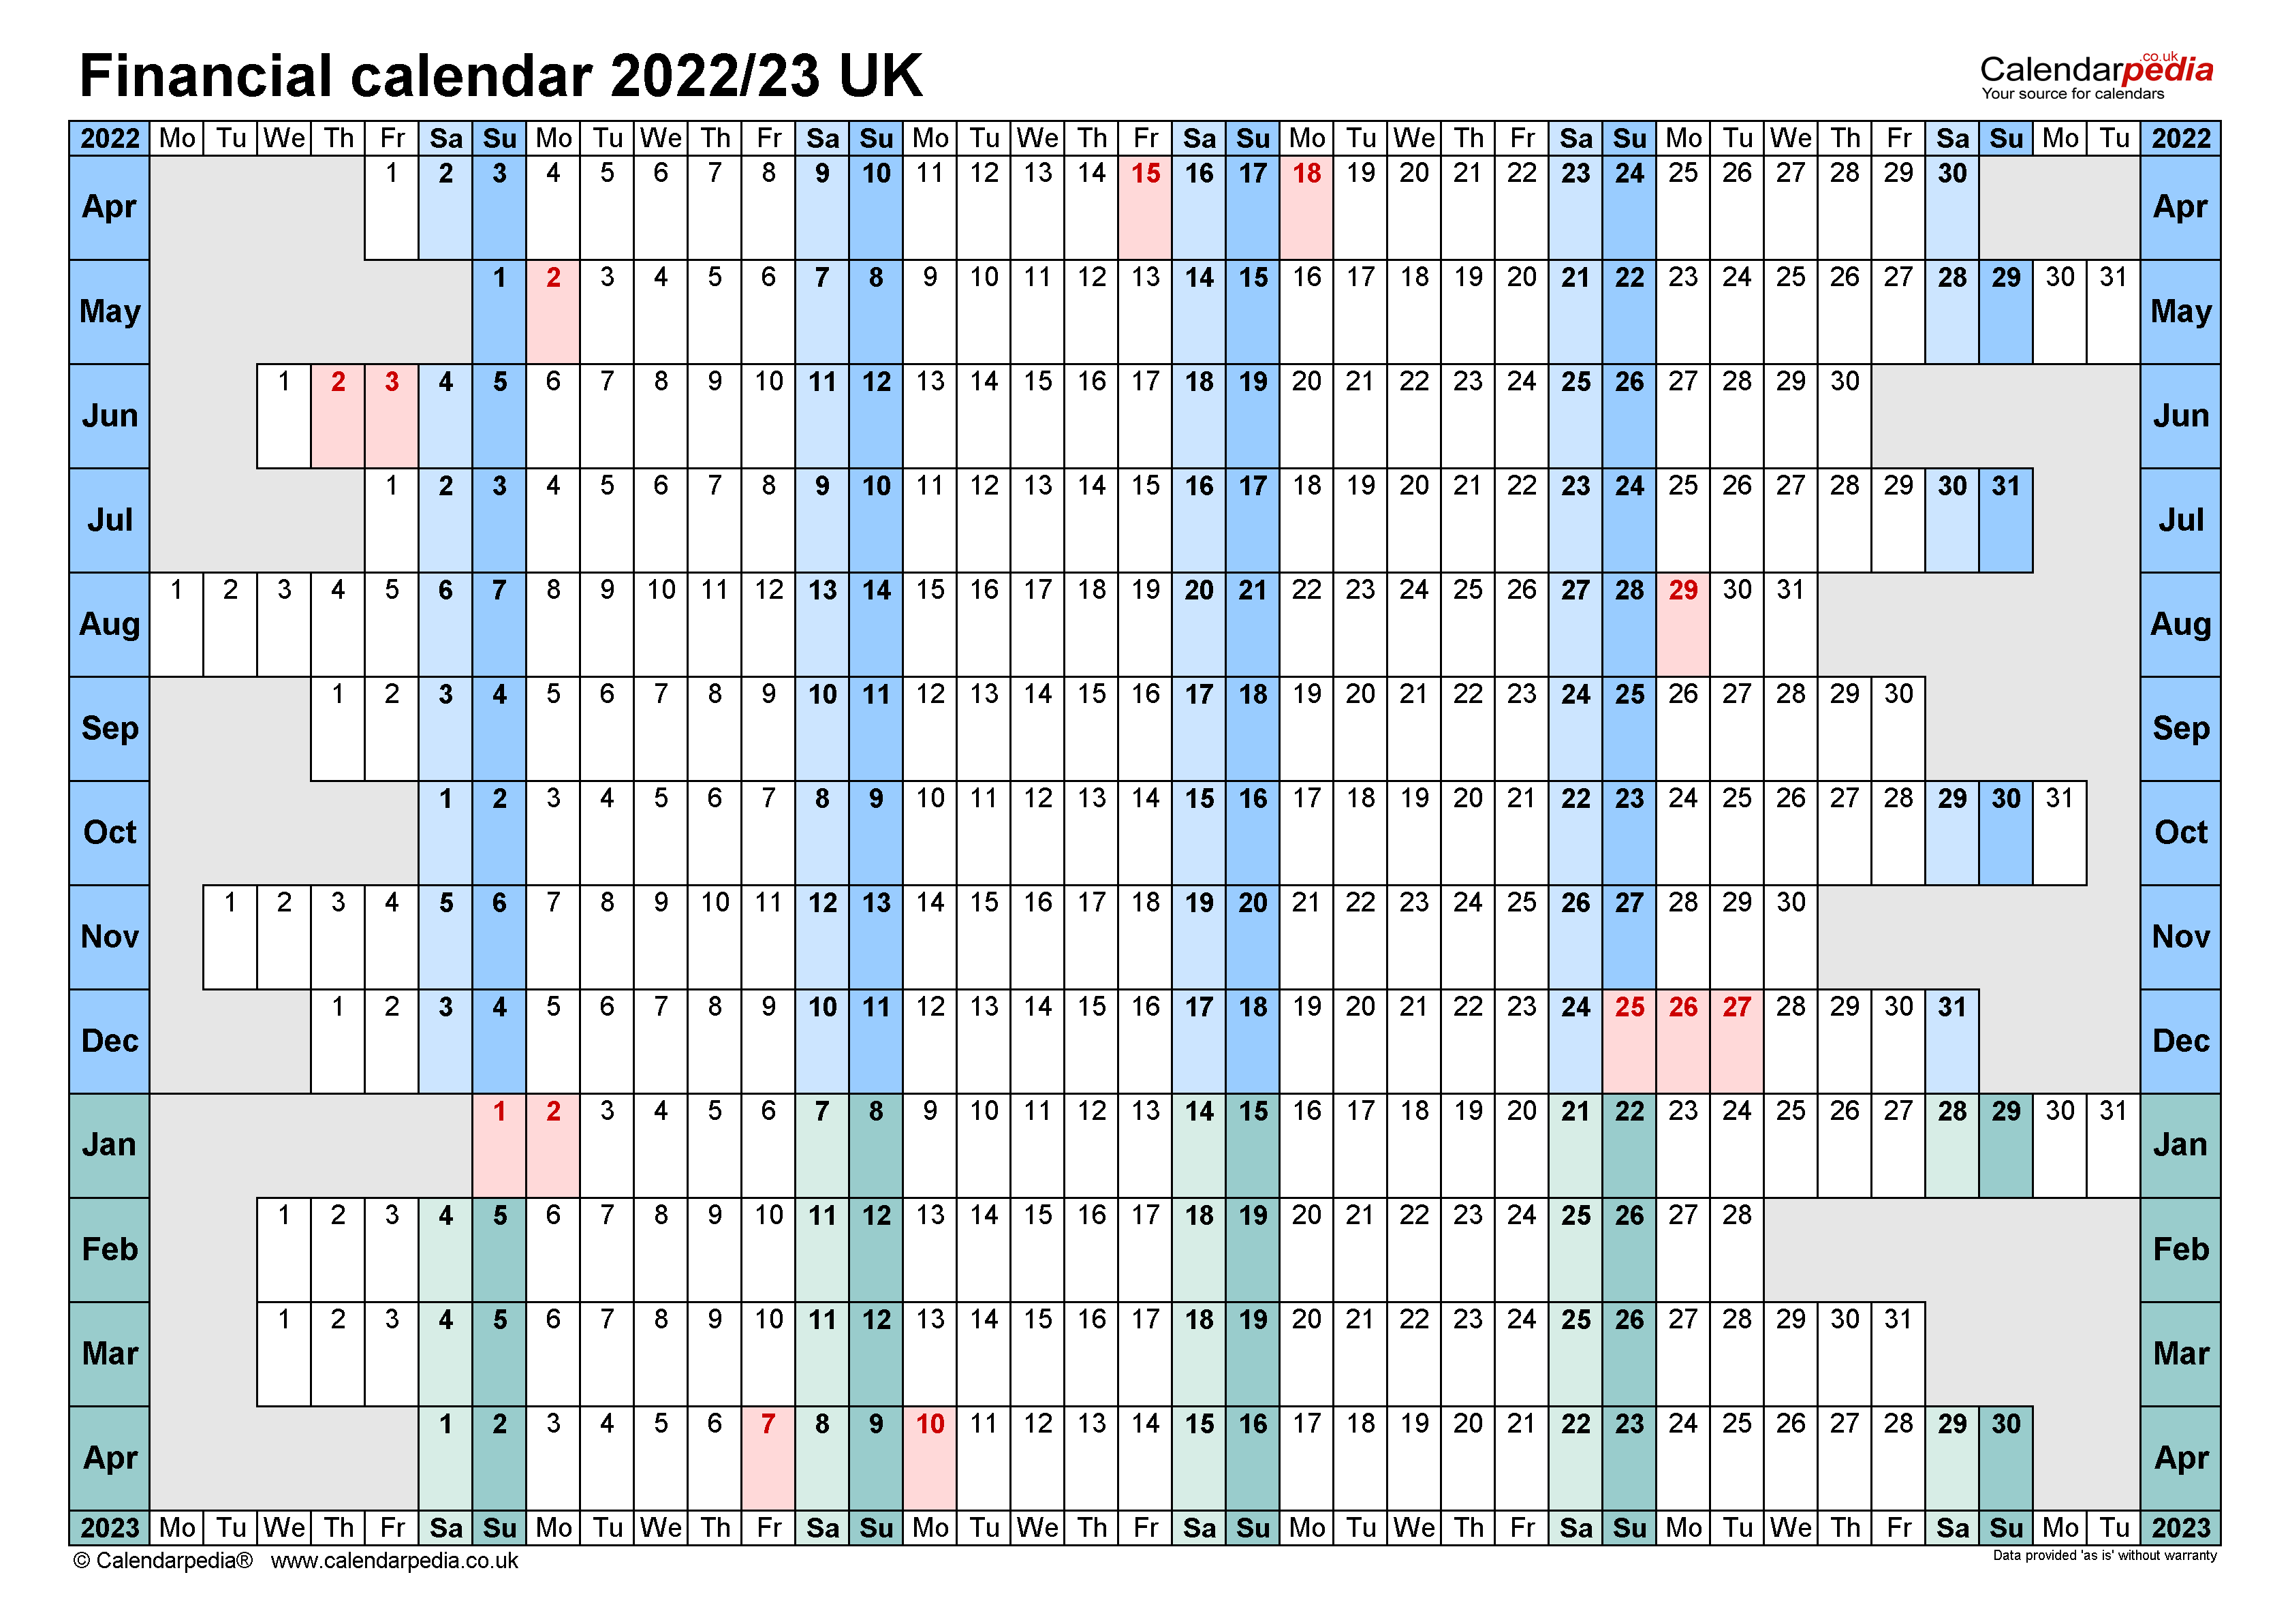 Financial Calendars 2022 23 Uk In Microsoft Word Format